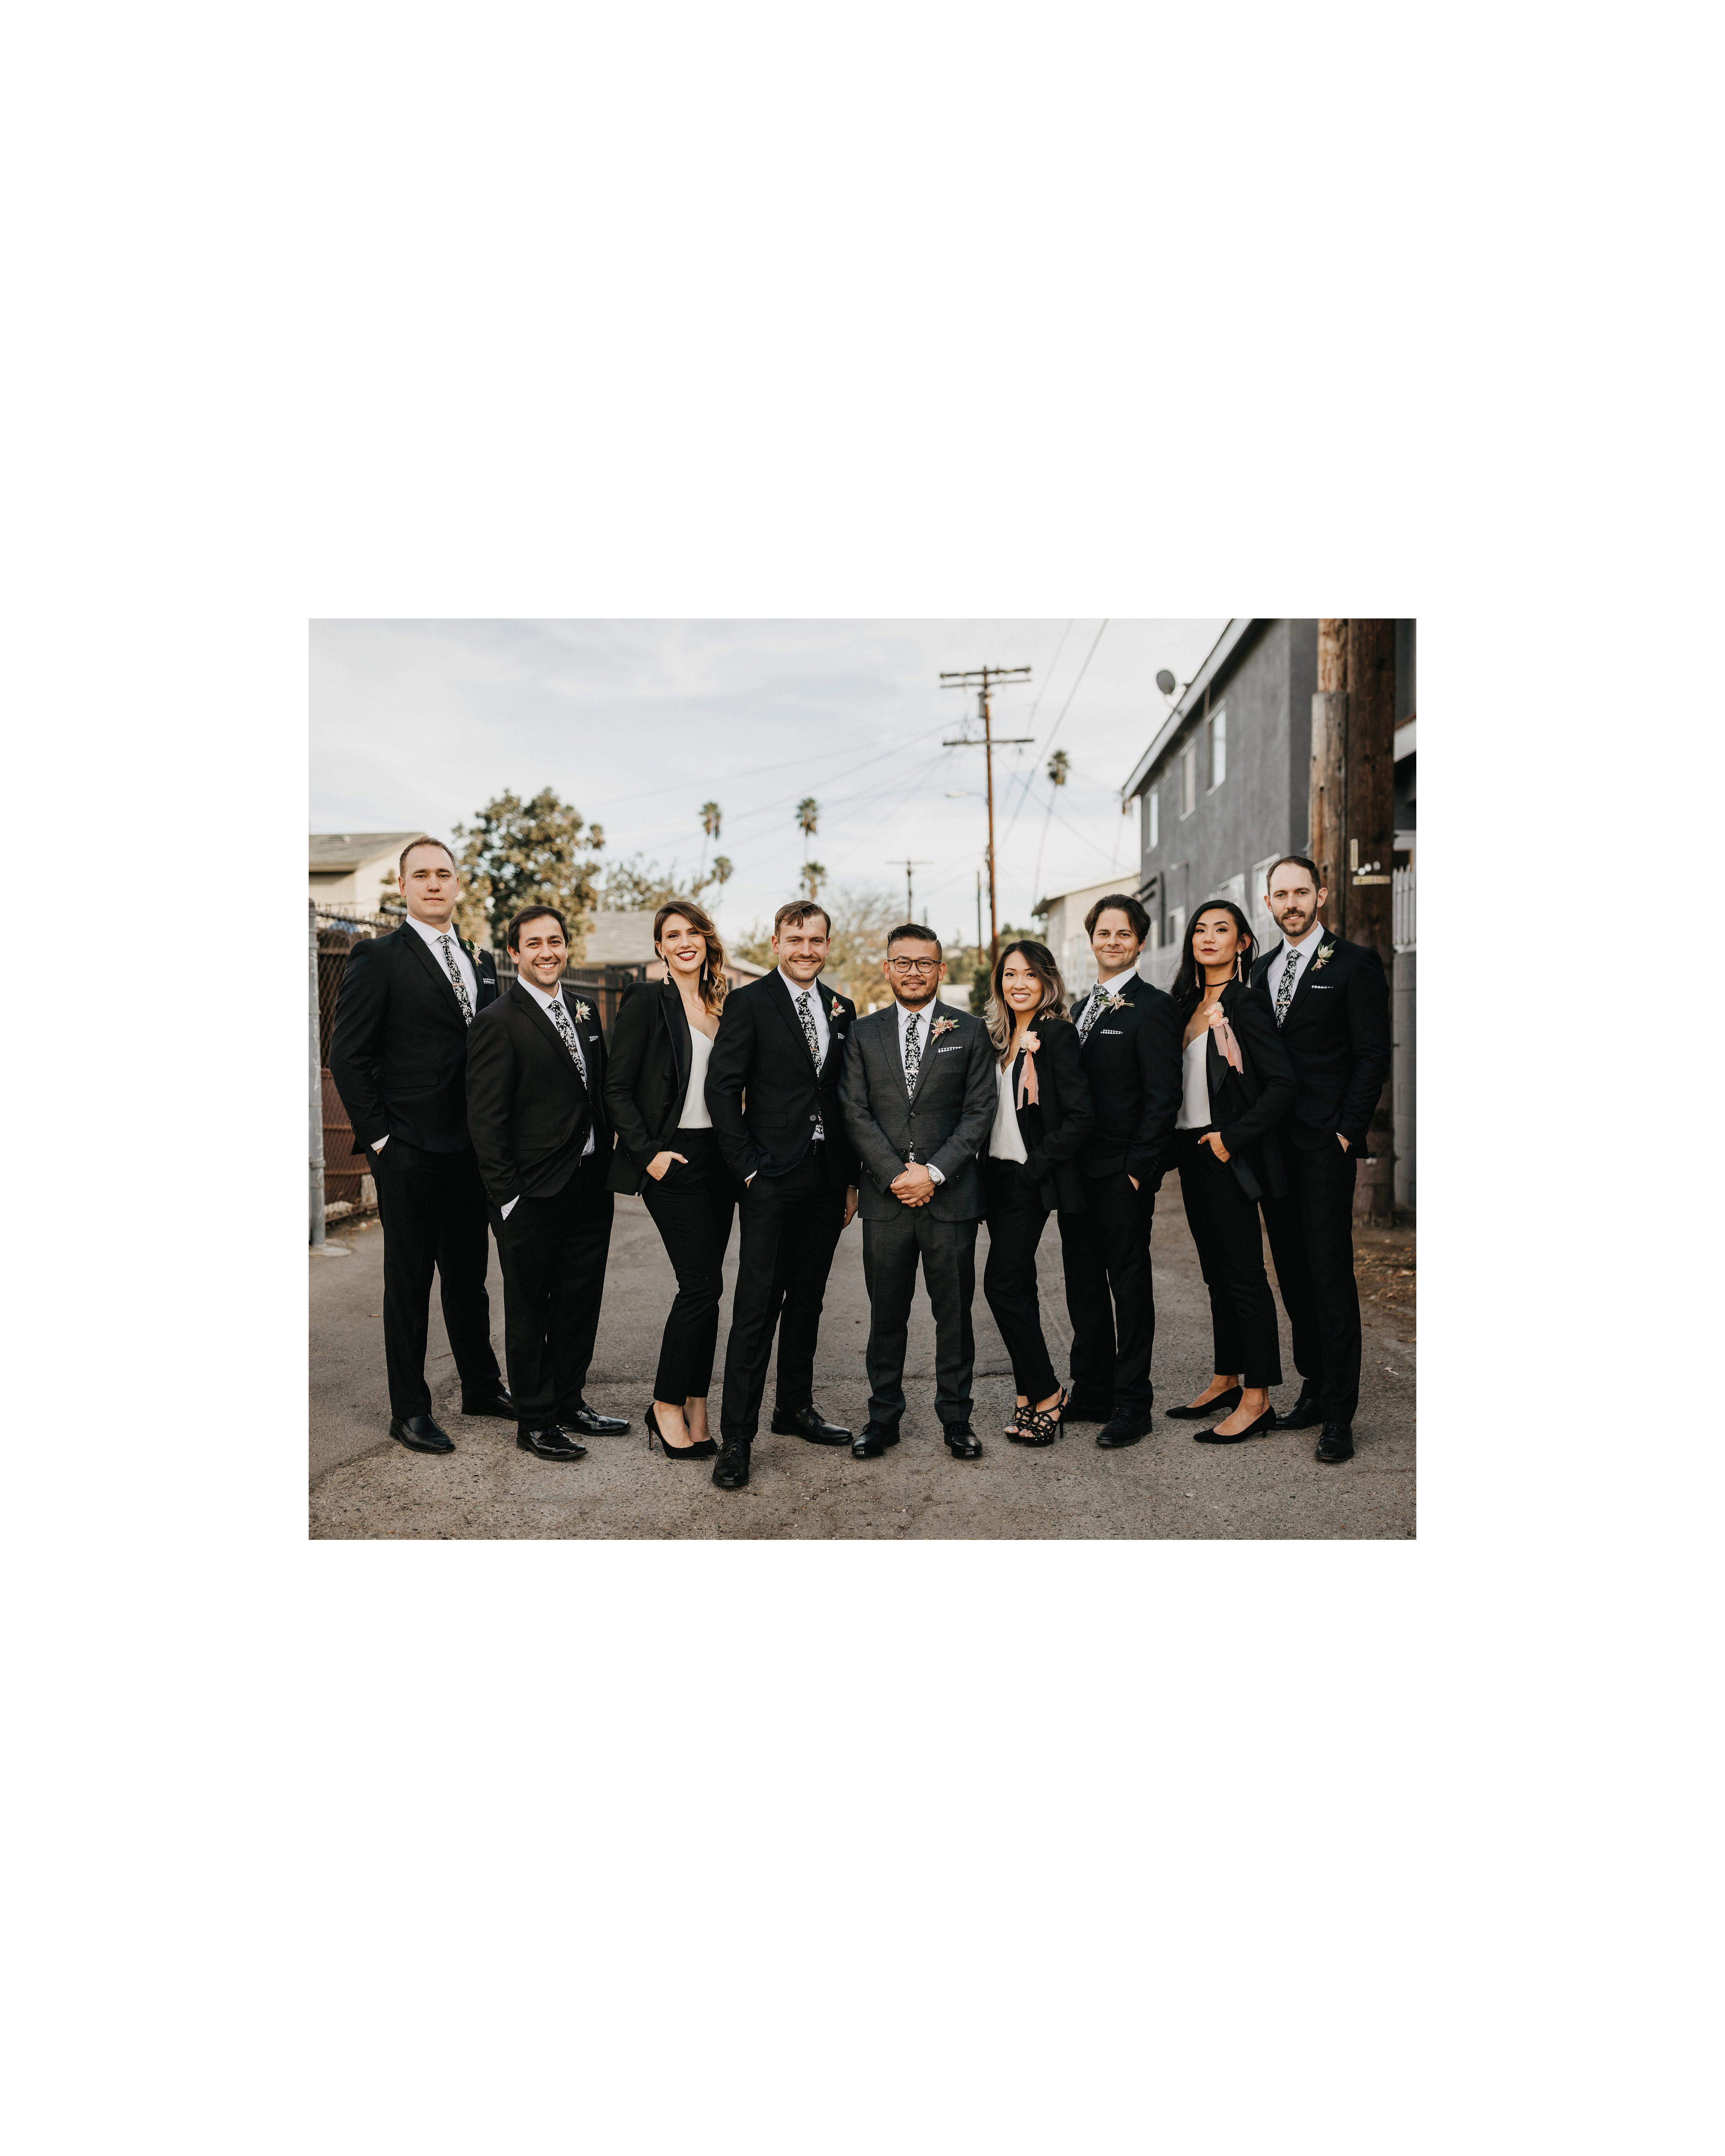 colleen pip wedding groomsmen groomsmaids